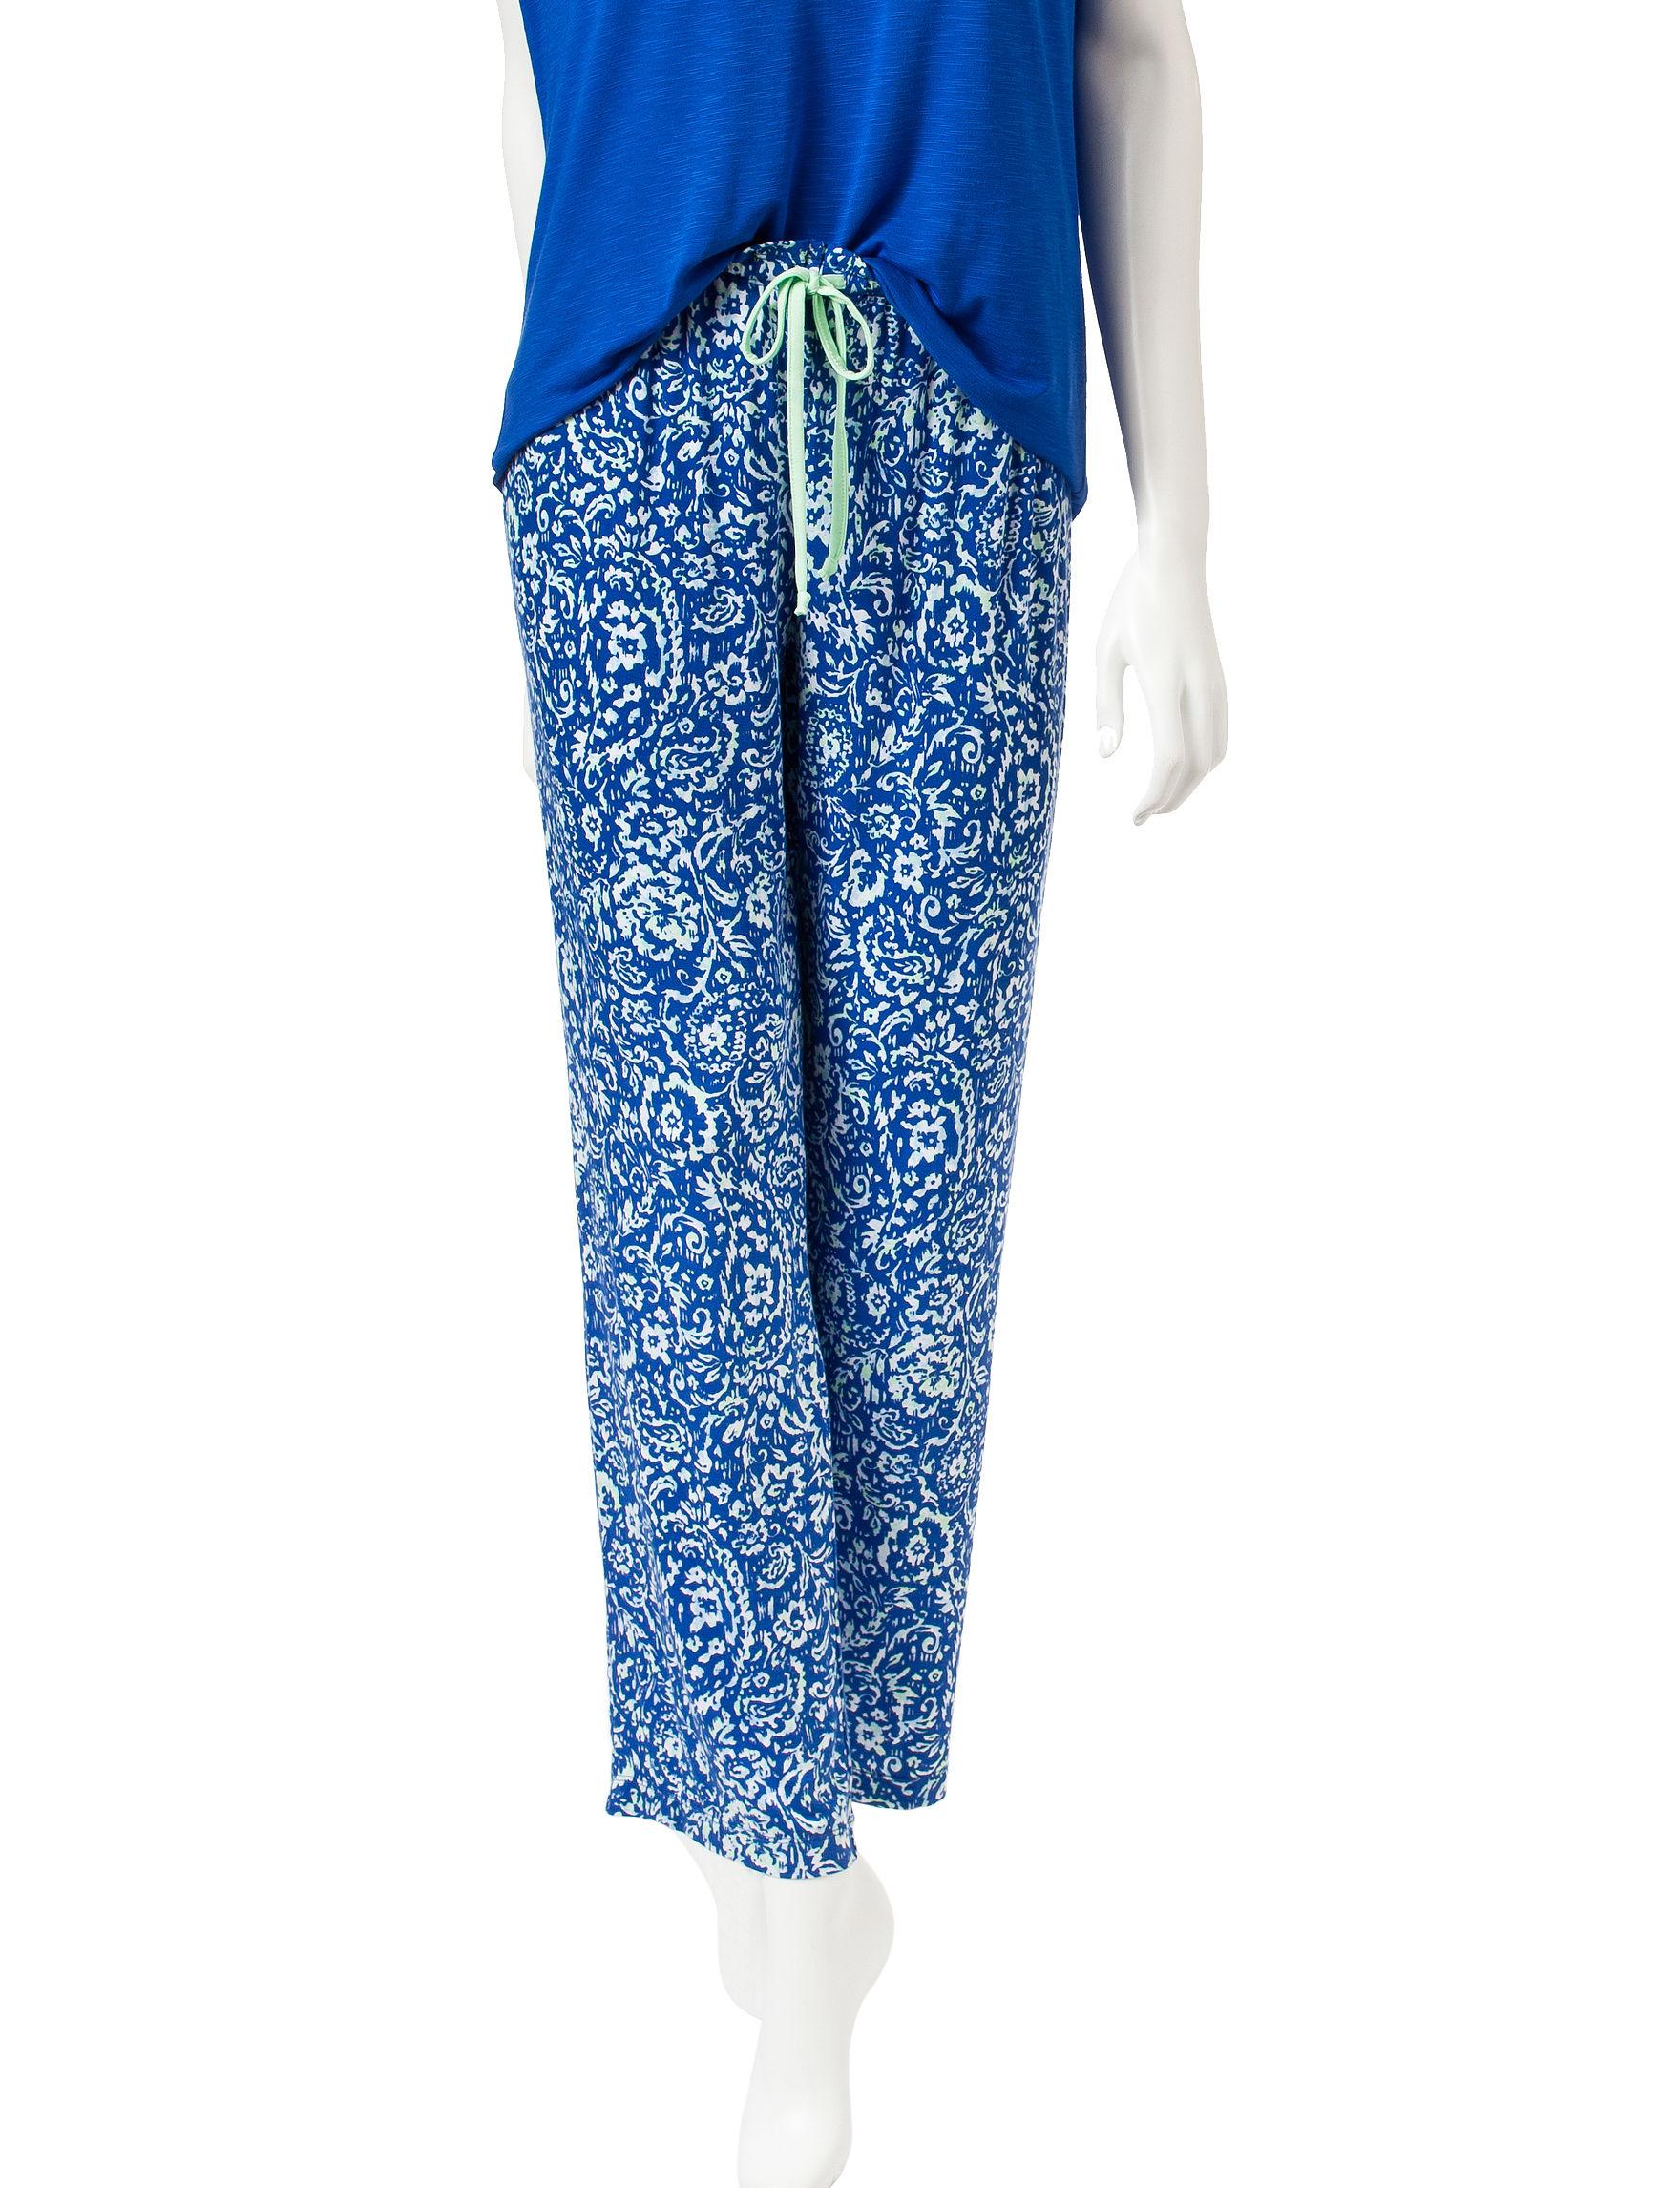 Laura Ashley Blue Paisley Pajama Bottoms